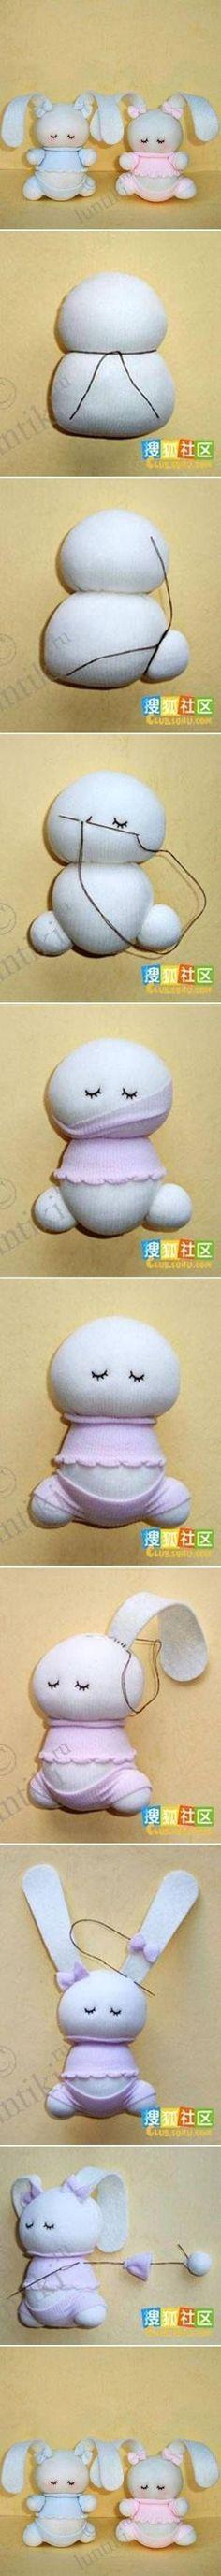 DIY Adorable Sock Bunny by TamidP